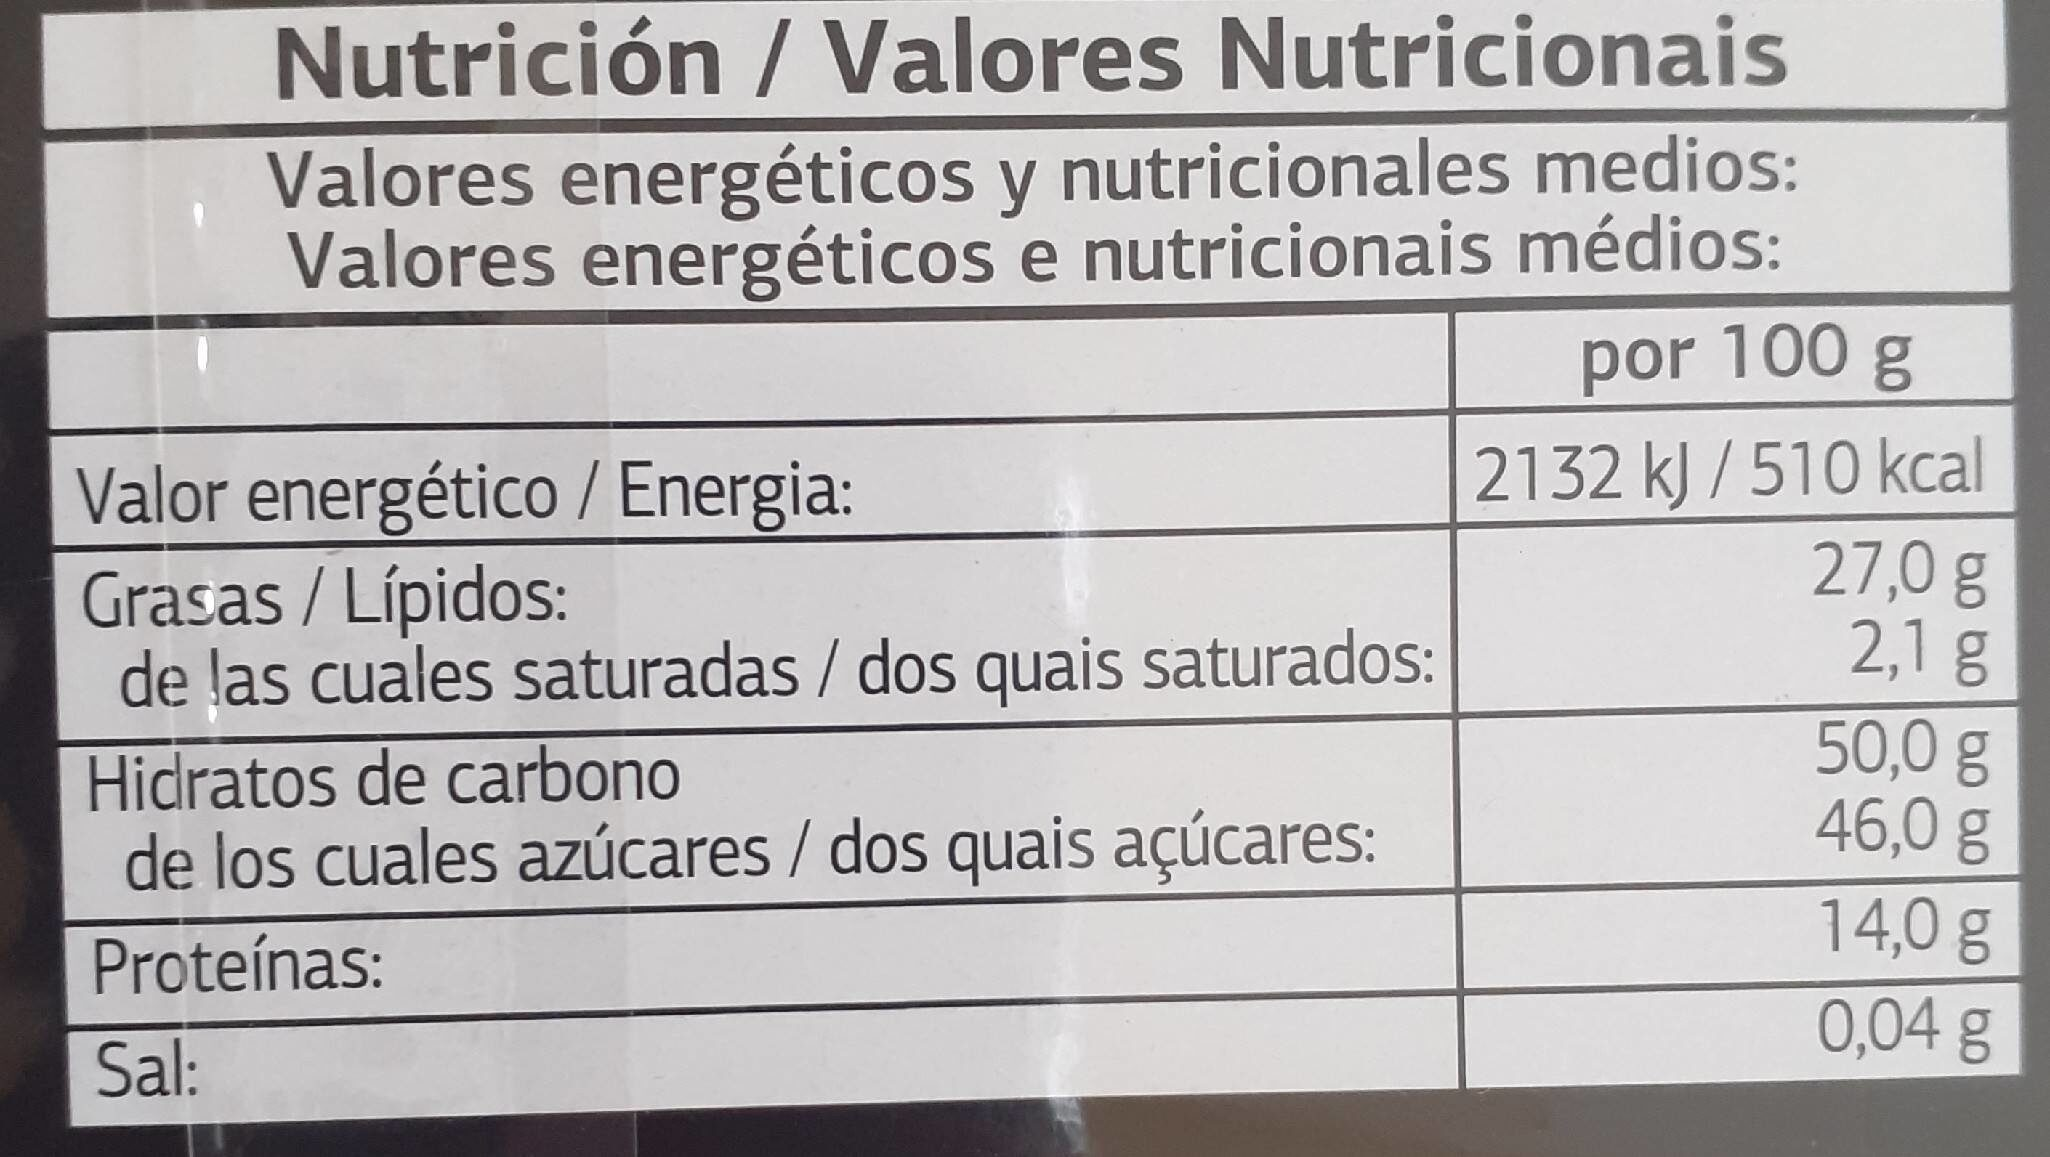 Turrón de guirlache - Información nutricional - fr